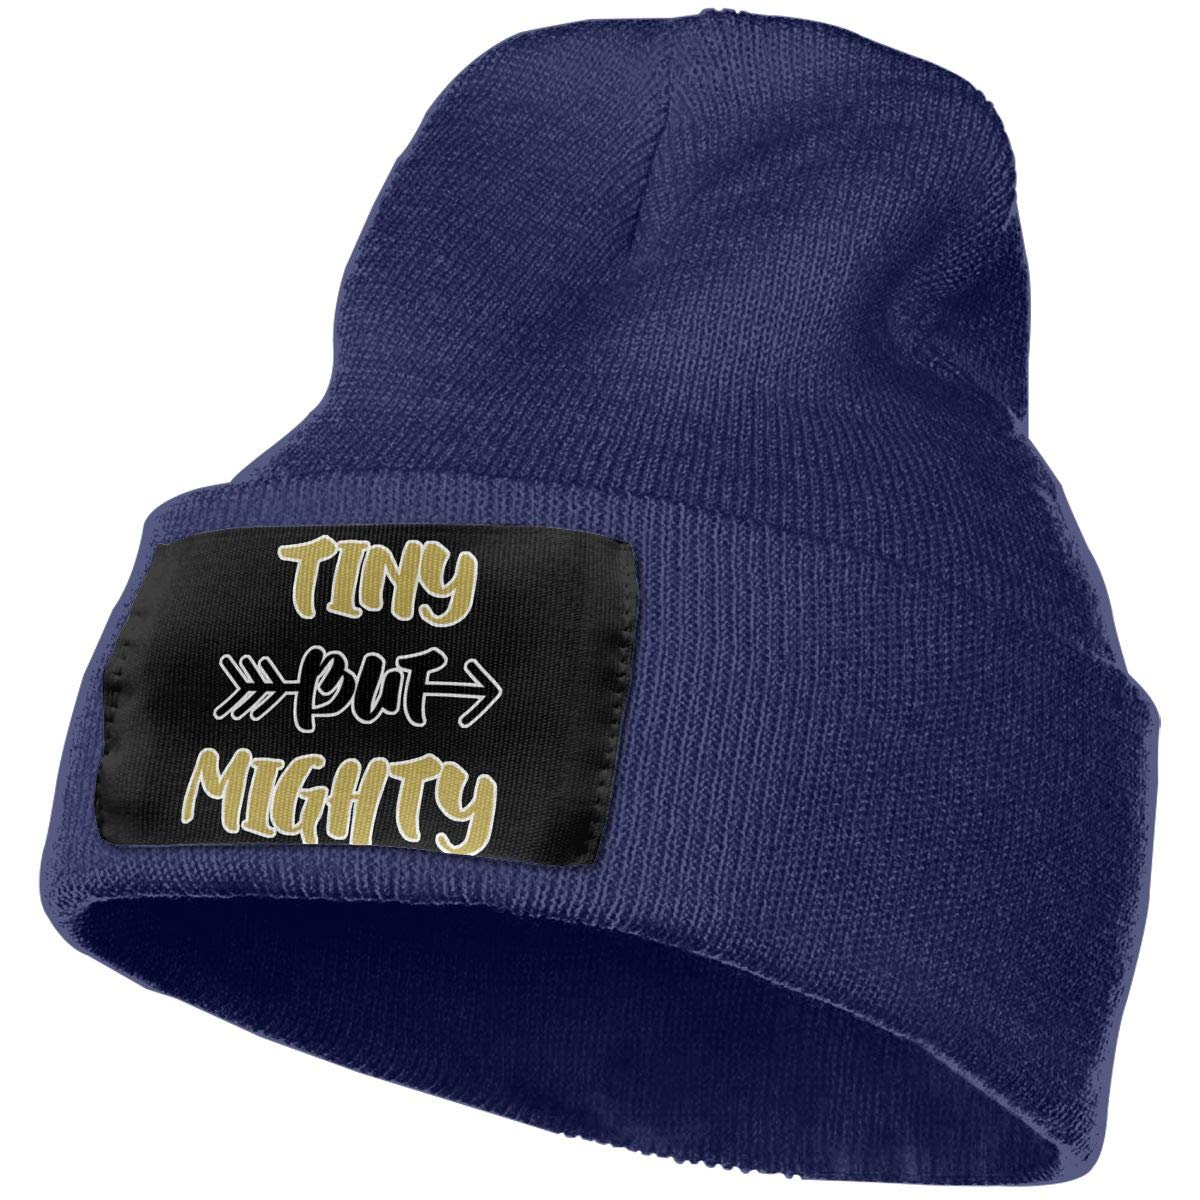 SLADDD1 Tiny But Mighty Warm Winter Hat Knit Beanie Skull Cap Cuff Beanie Hat Winter Hats for Men /& Women